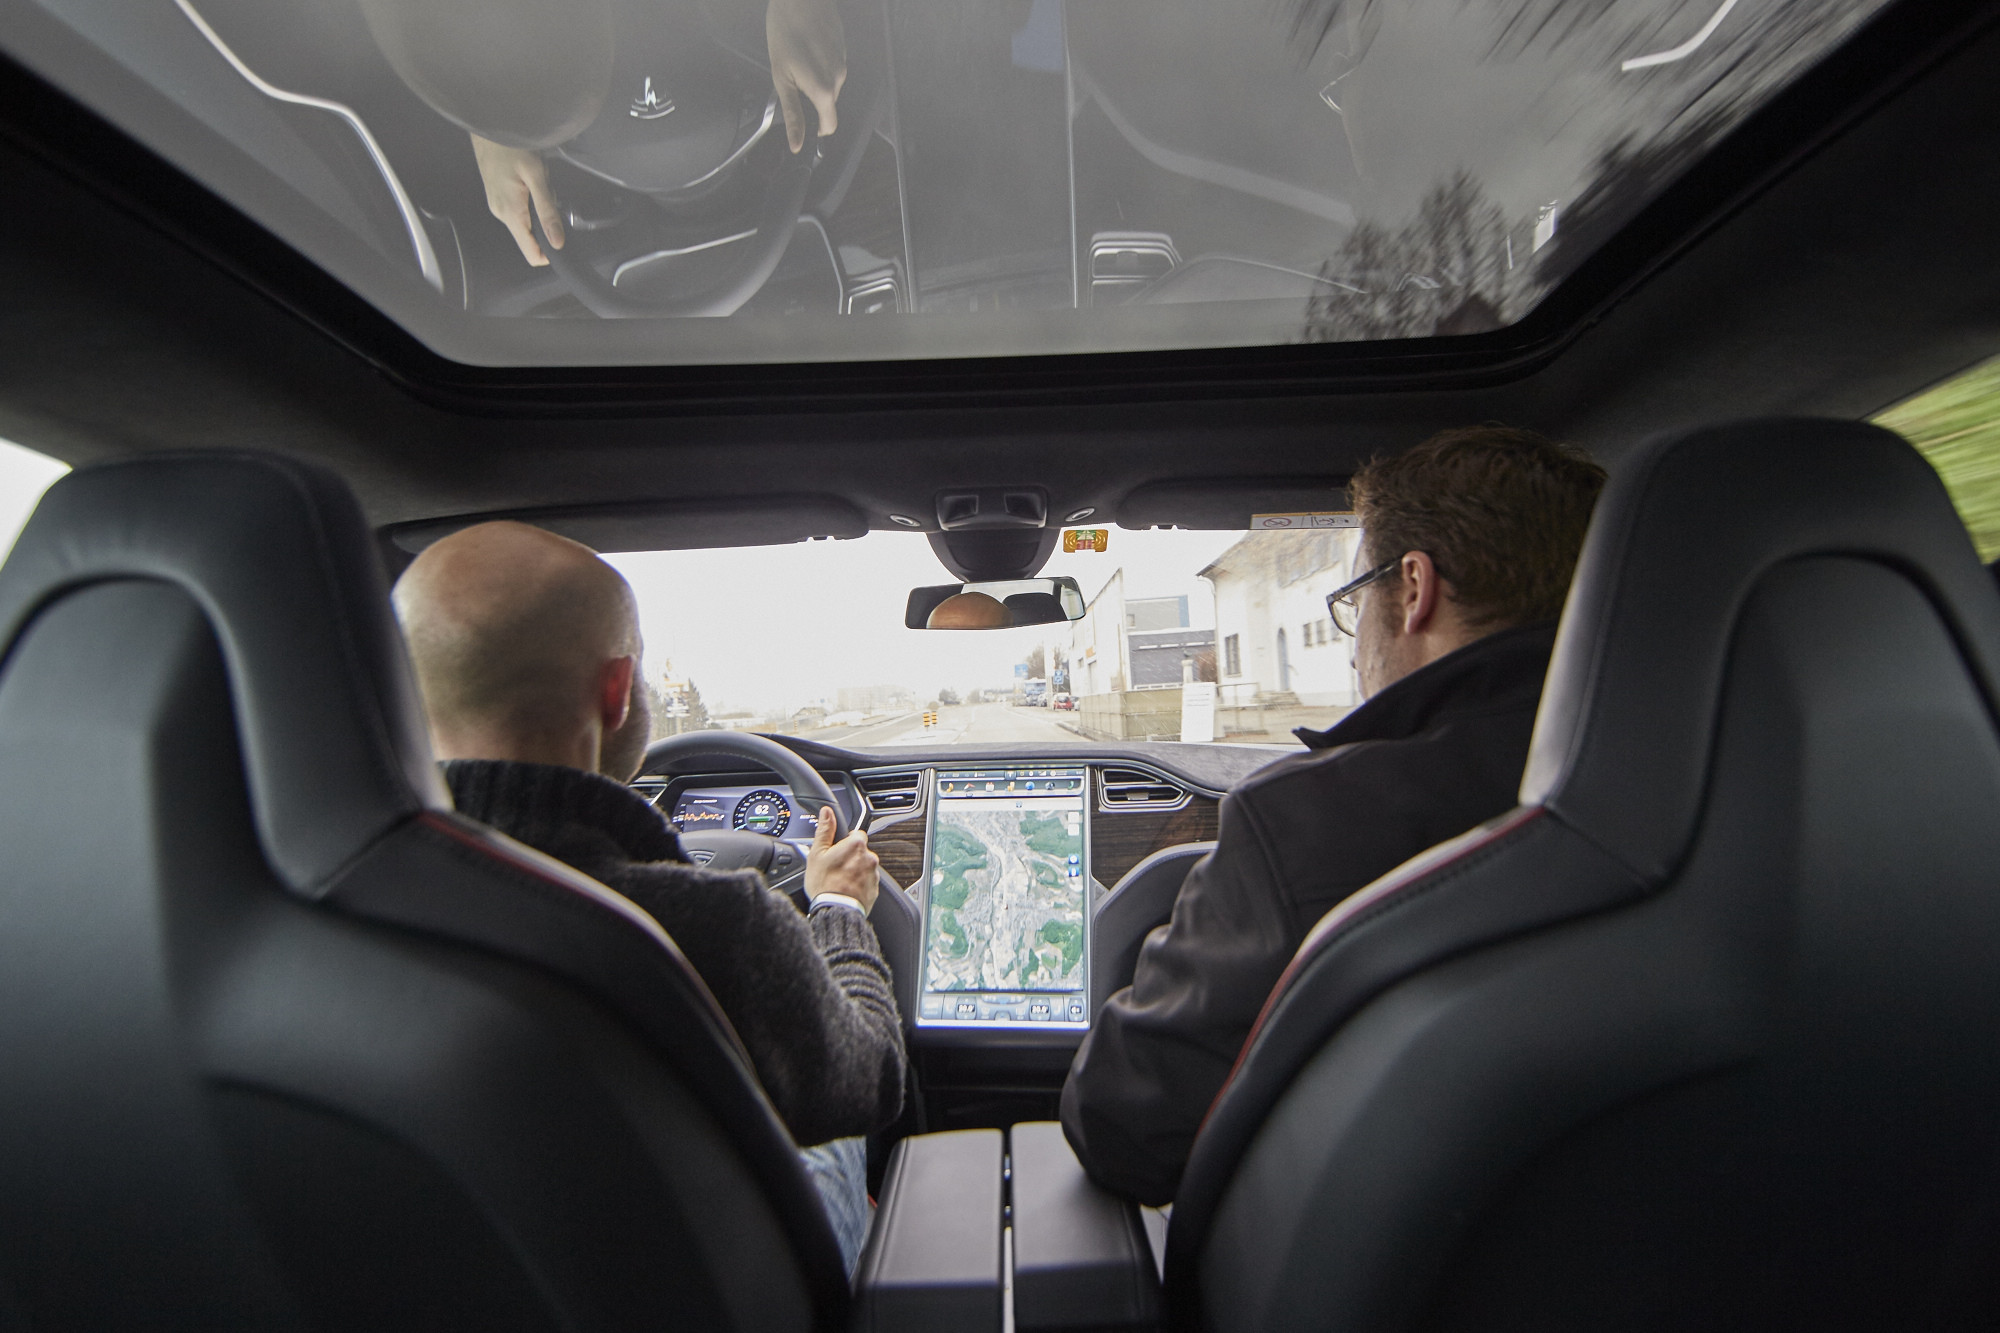 Testfahrt im Tesla: Das stärkste Auto seit dem Elektromotor | TagesWoche